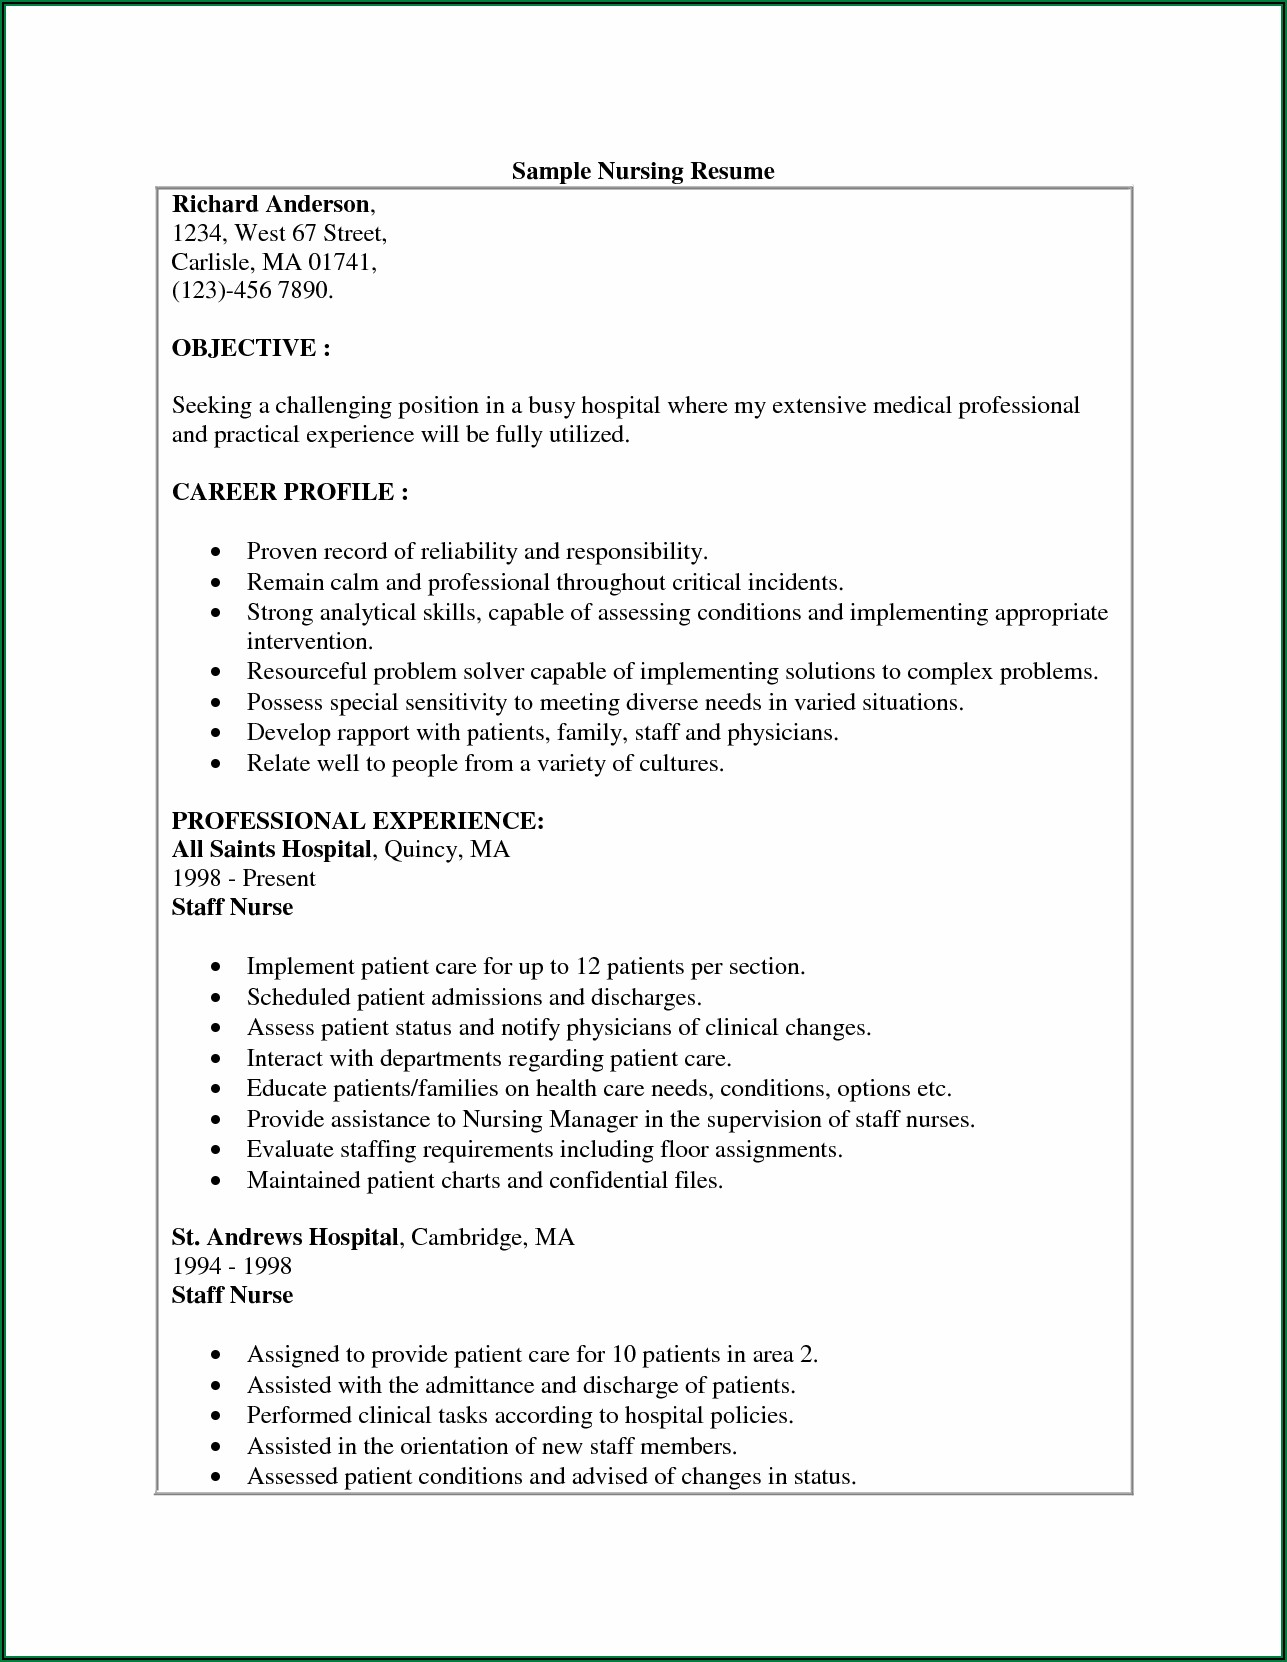 Resume Summary For Nursing Assistant